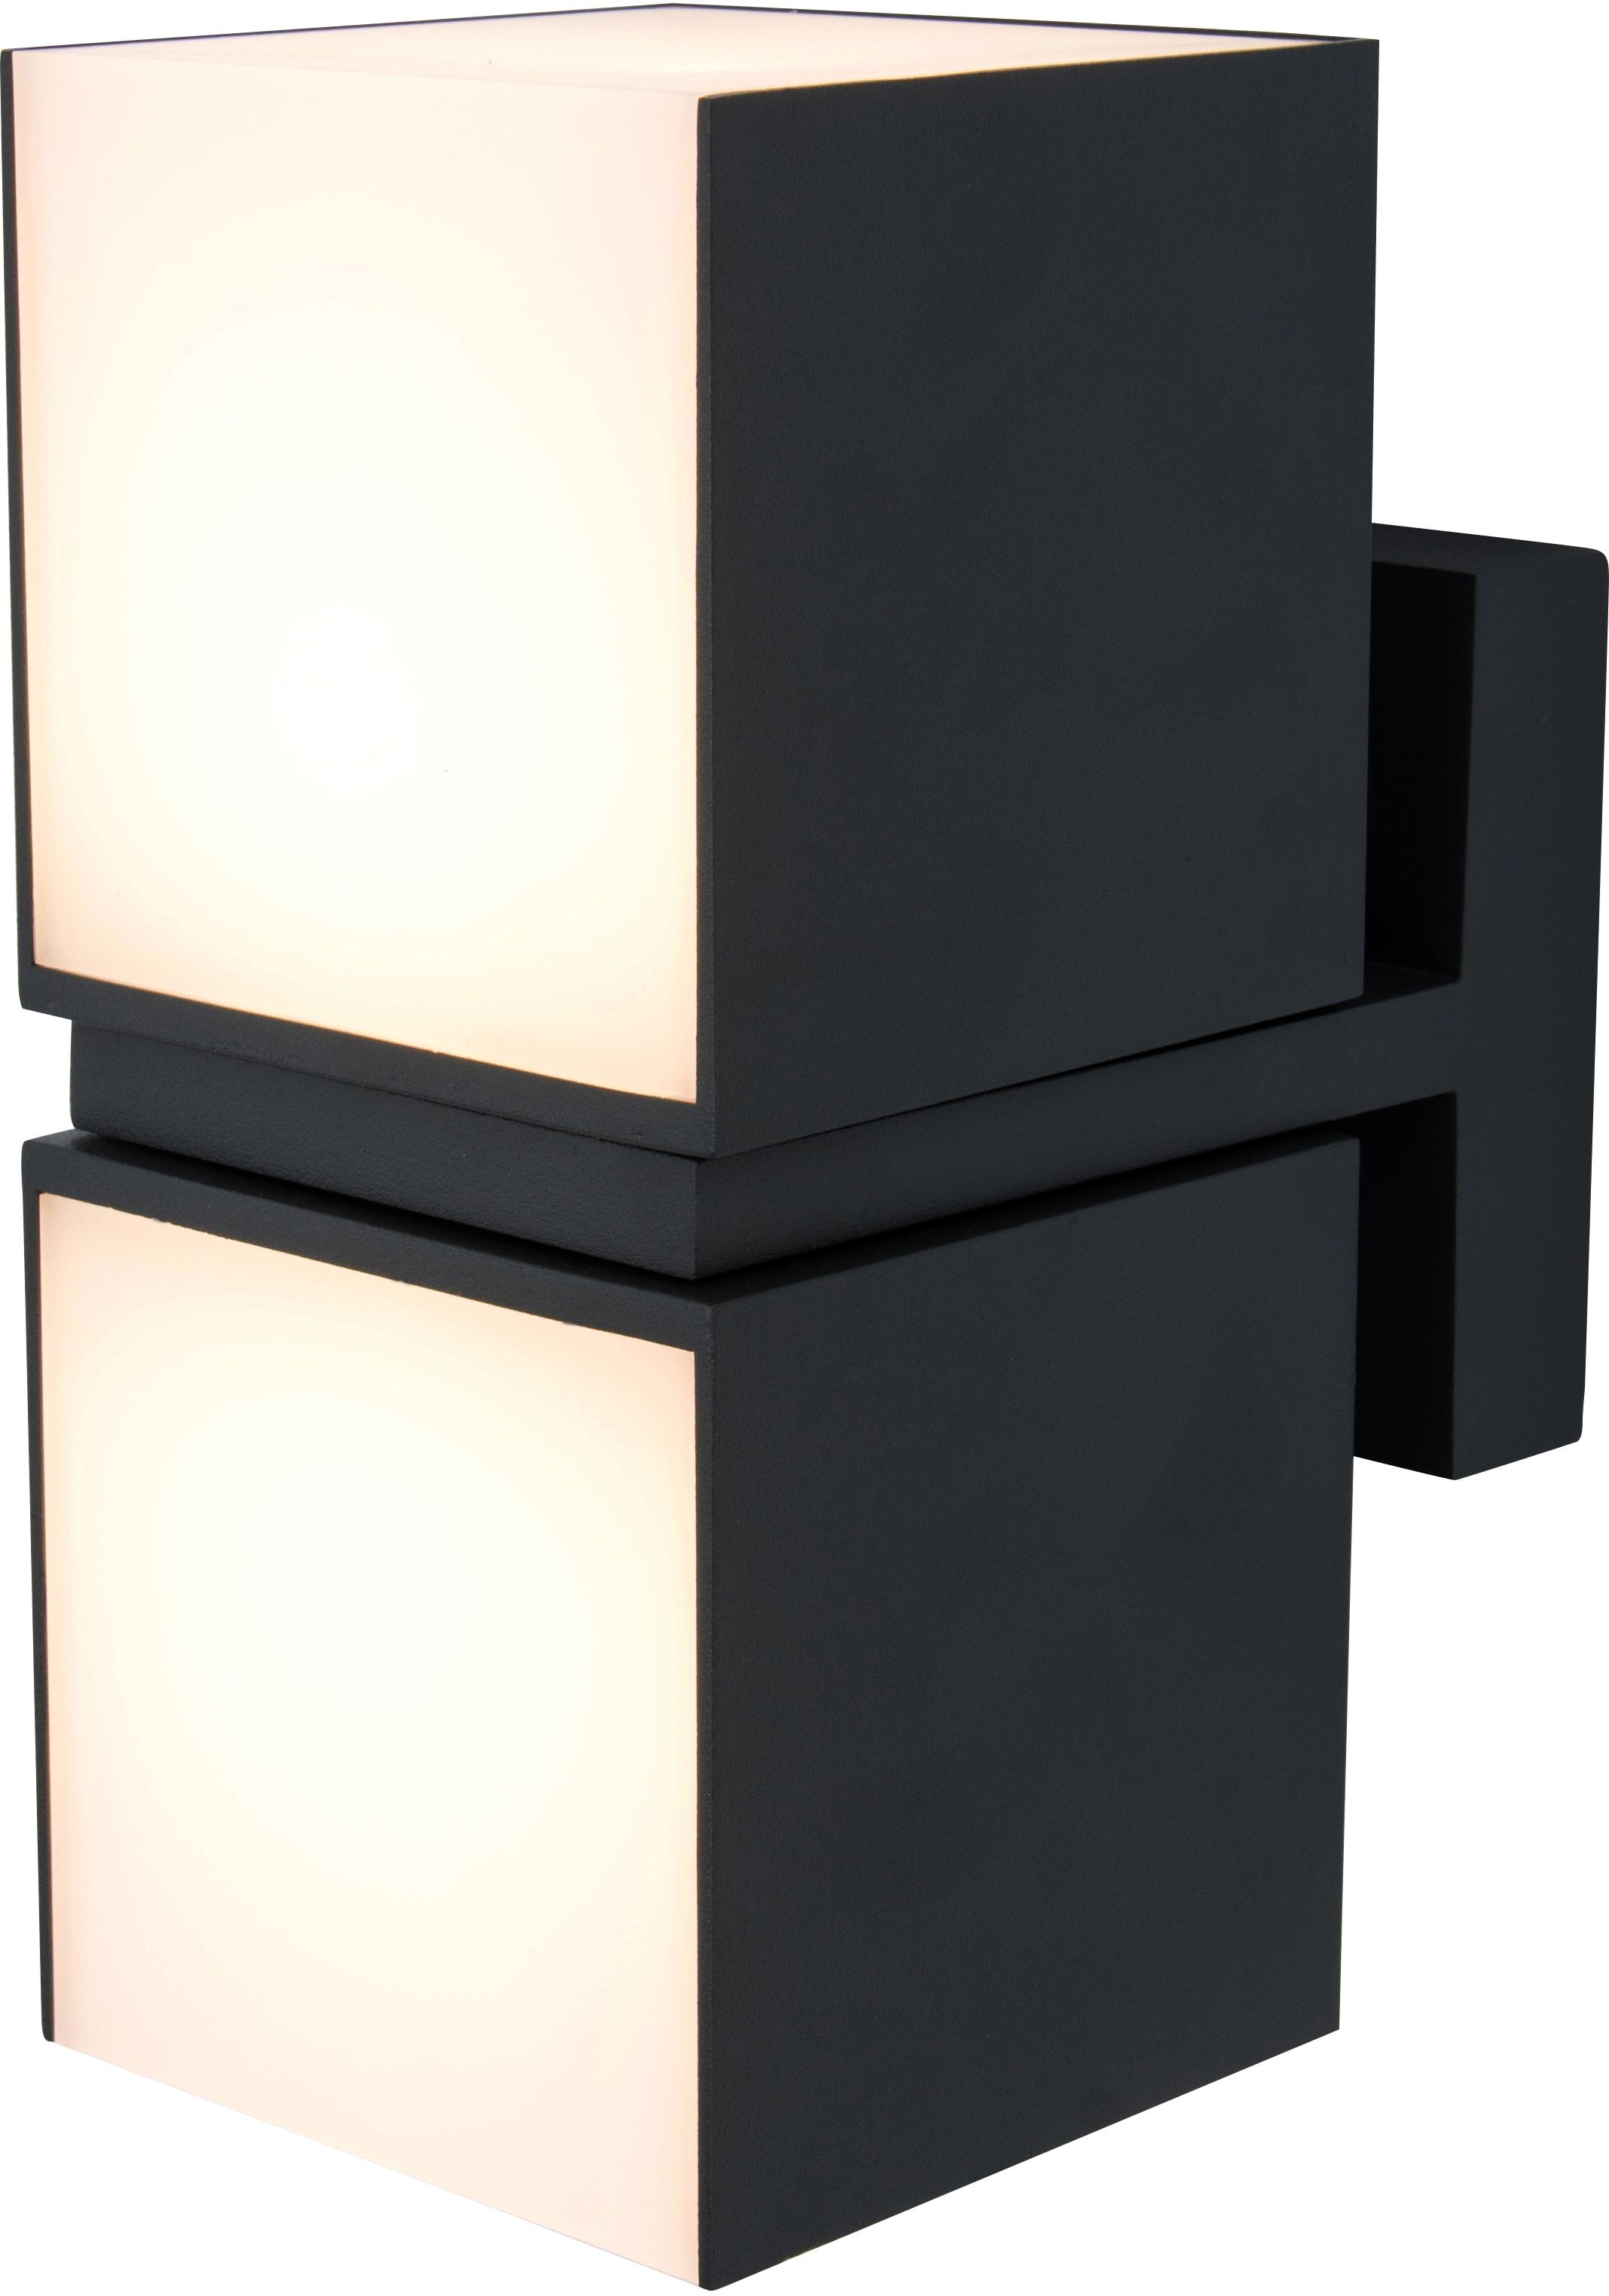 LUTEC LED Außen-Wandleuchte CUBA 5193801012, LED-Modul, 1 St., Warmweiß